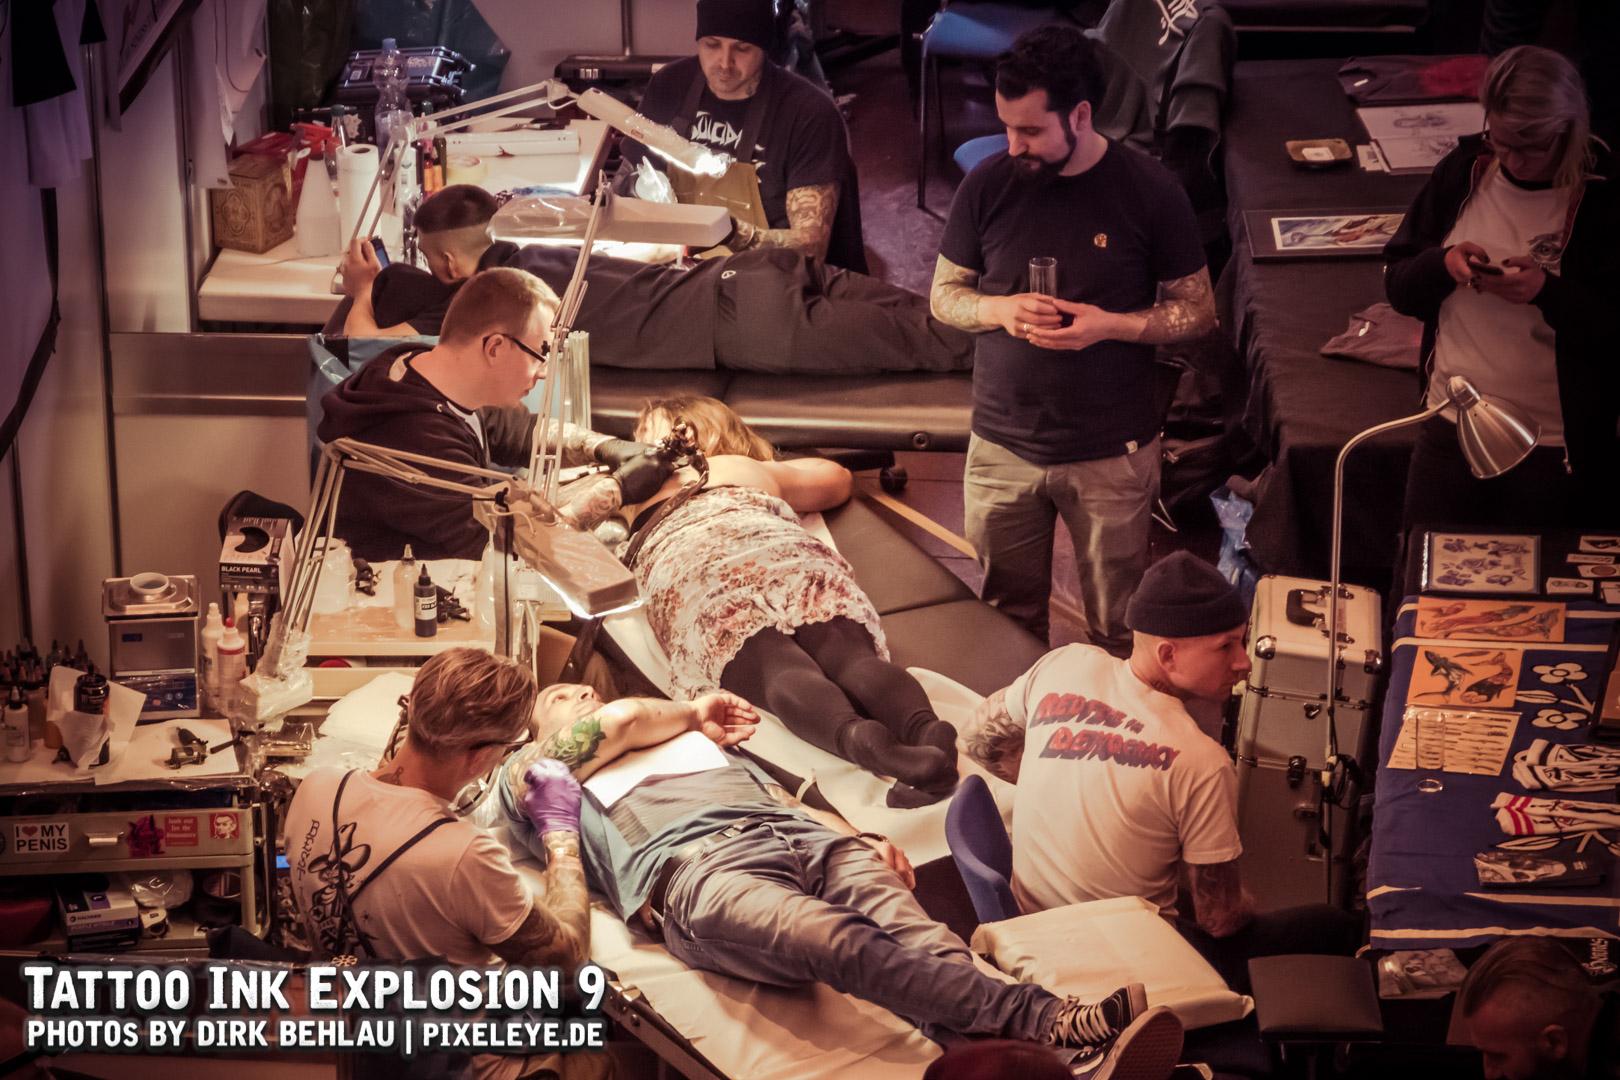 Tattoo Ink Explosion 2018 WEB by Dirk Behlau-0504.jpg